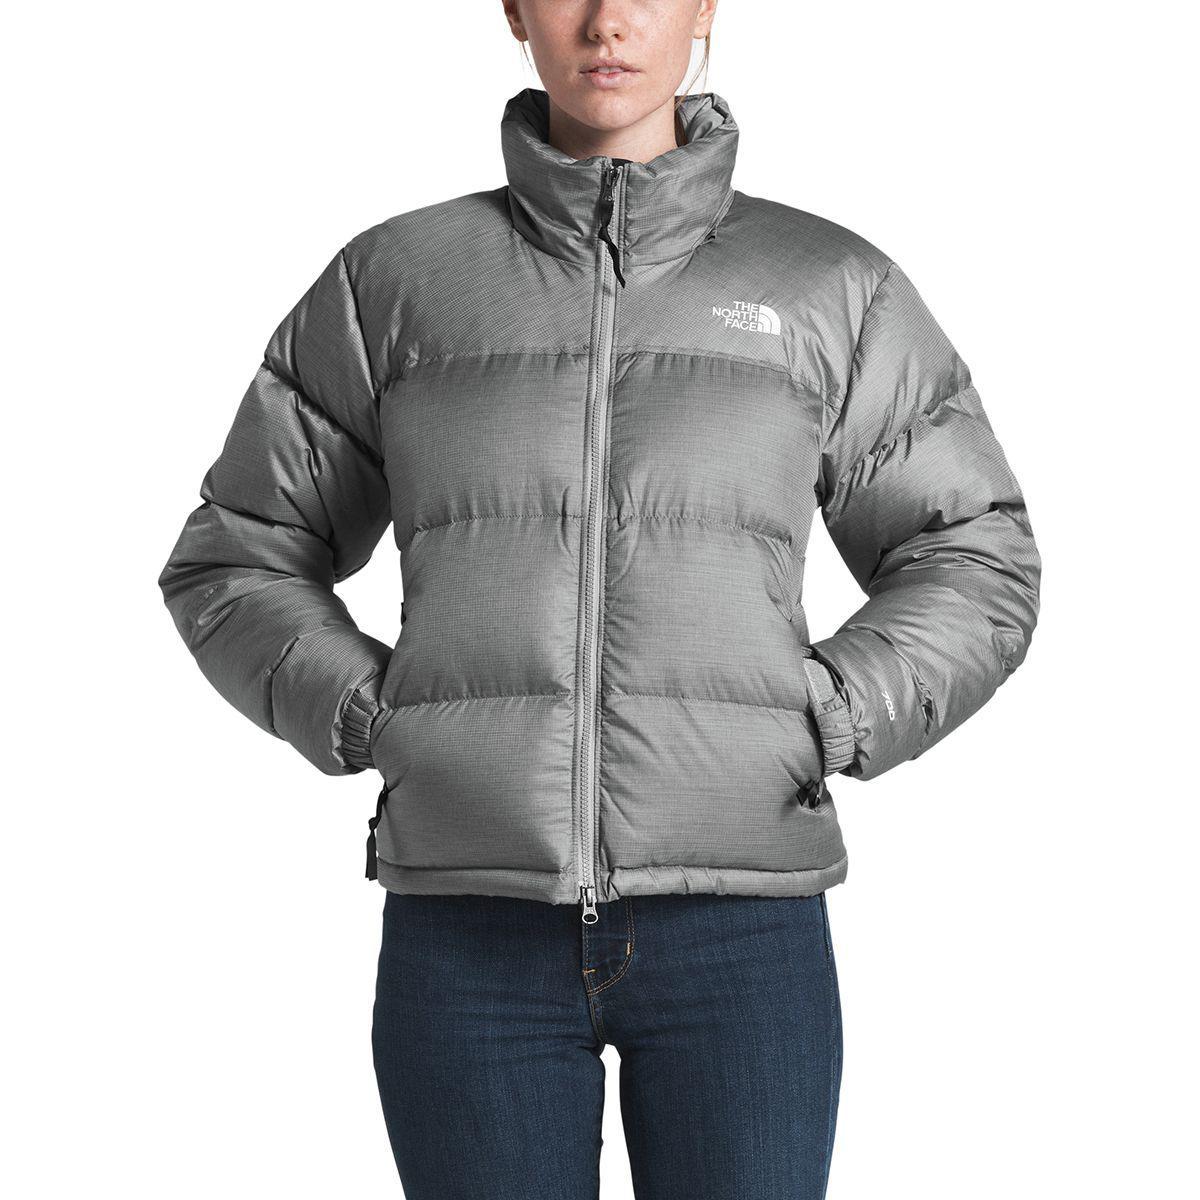 27b5ab7758 Lyst - The North Face 1996 Retro Nuptse Jacket in Gray